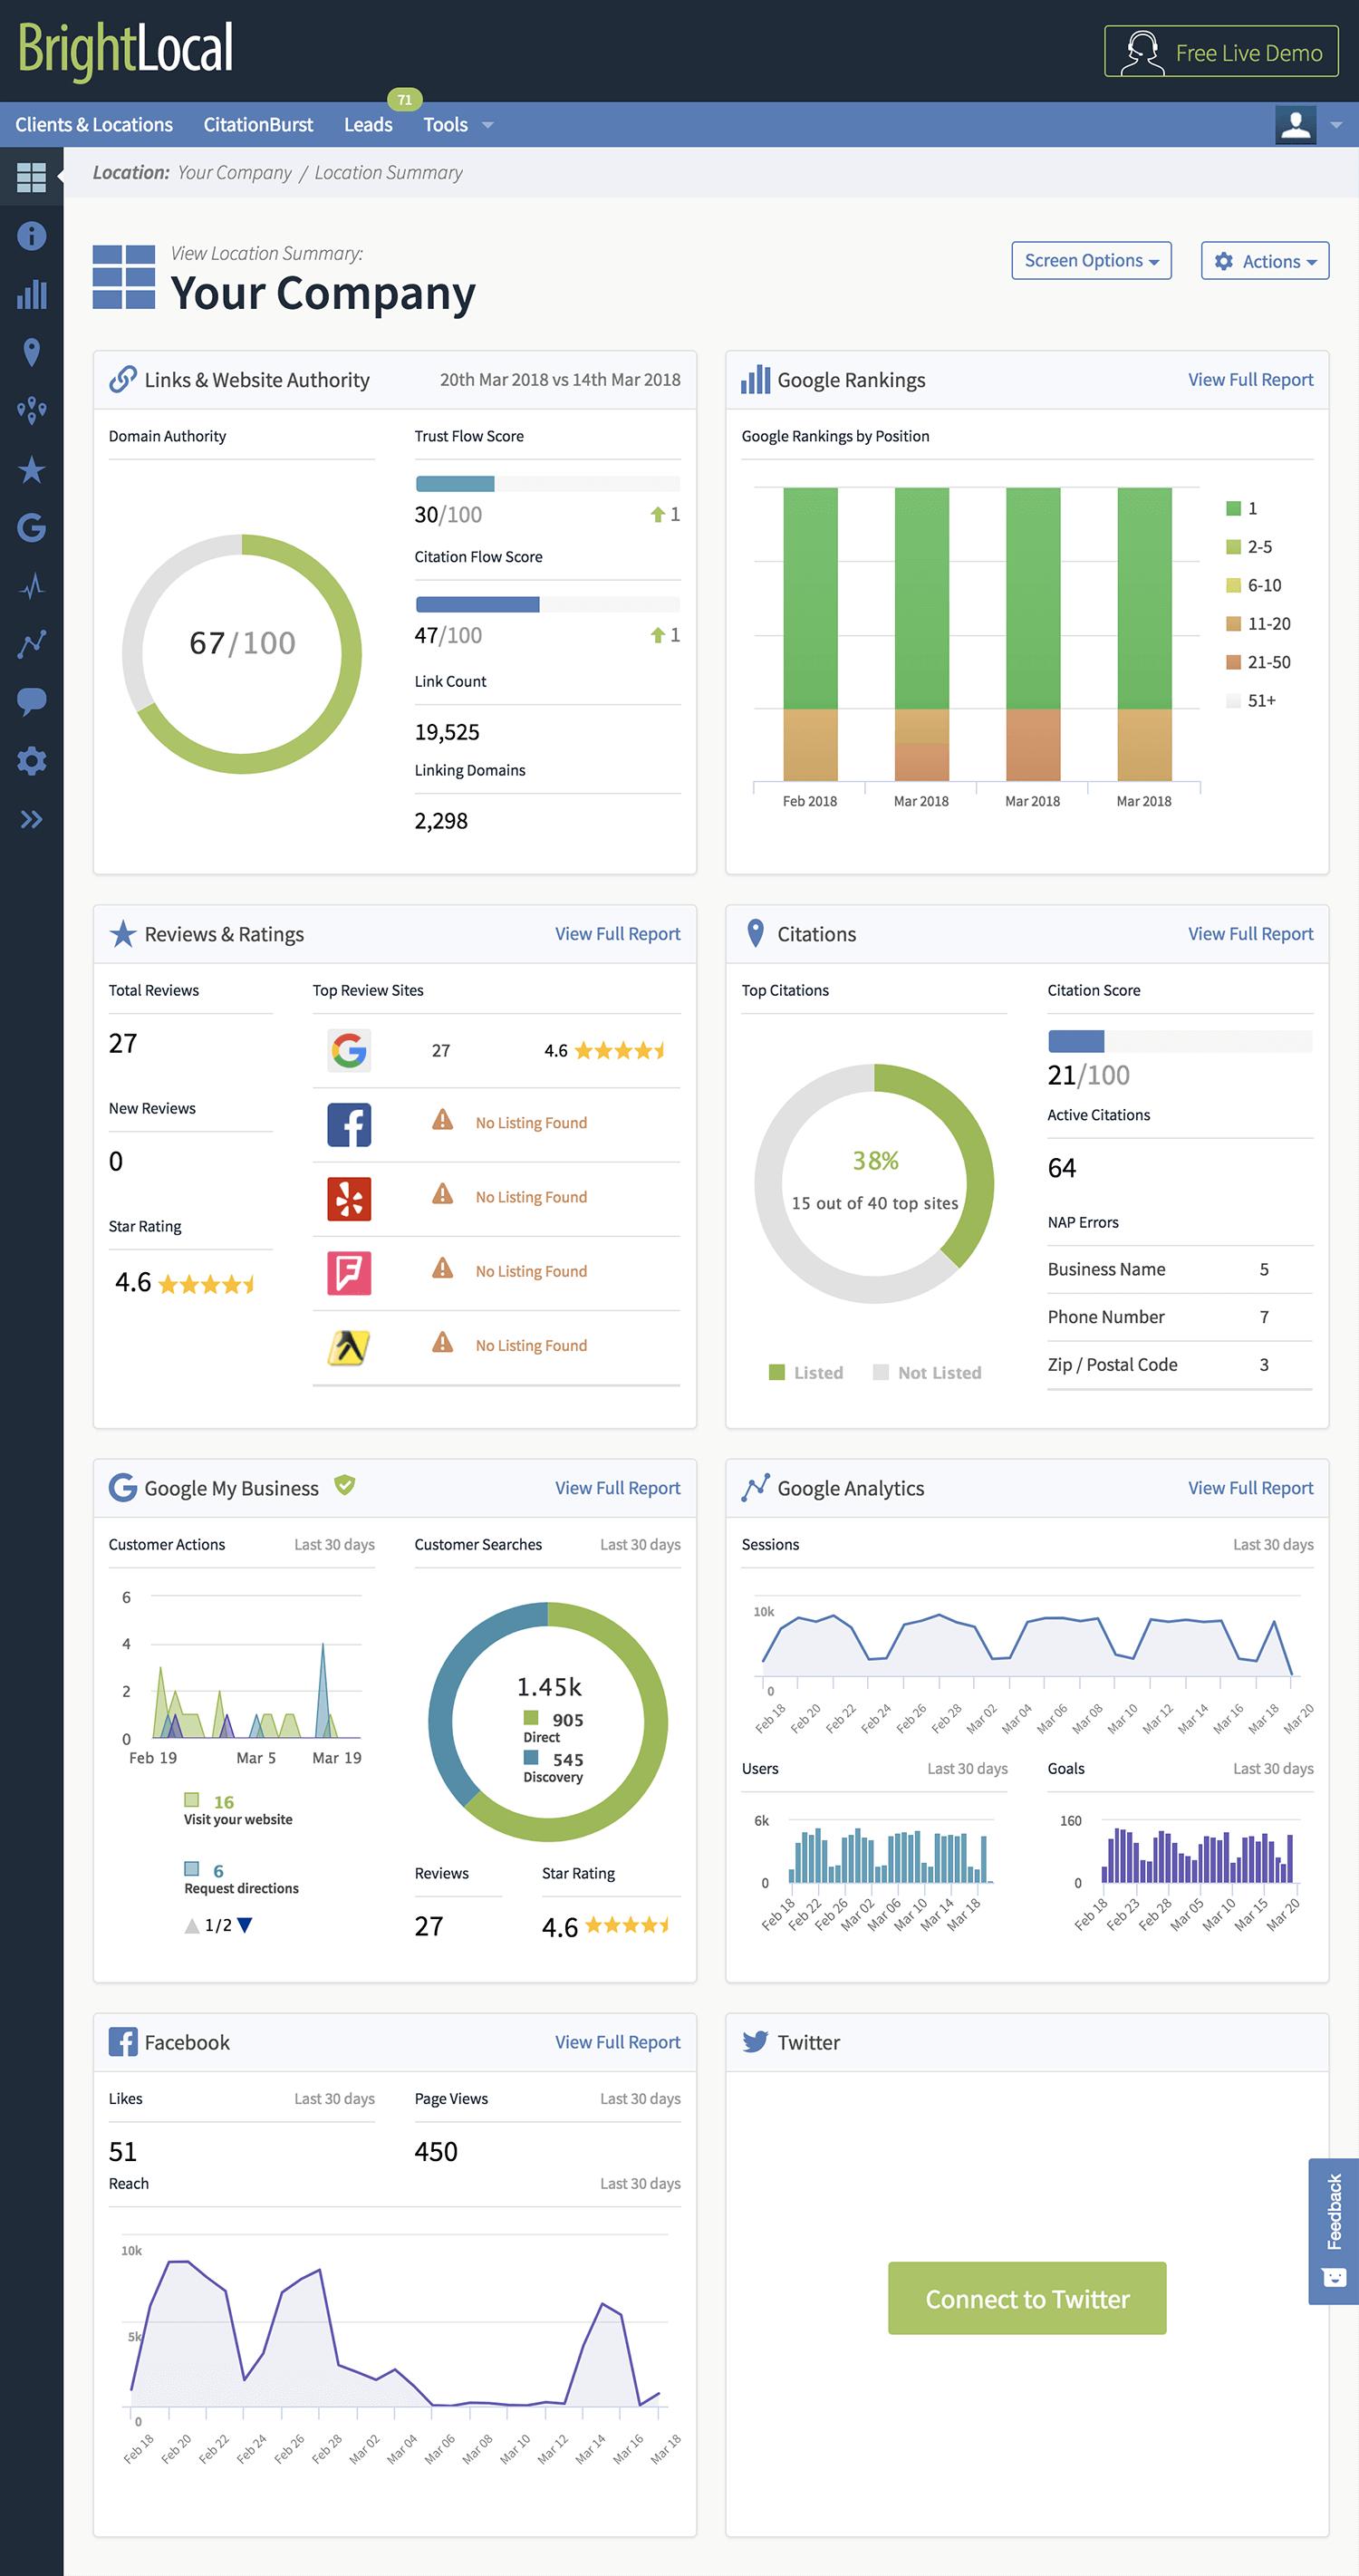 Location Dashboard Summary Screenshot